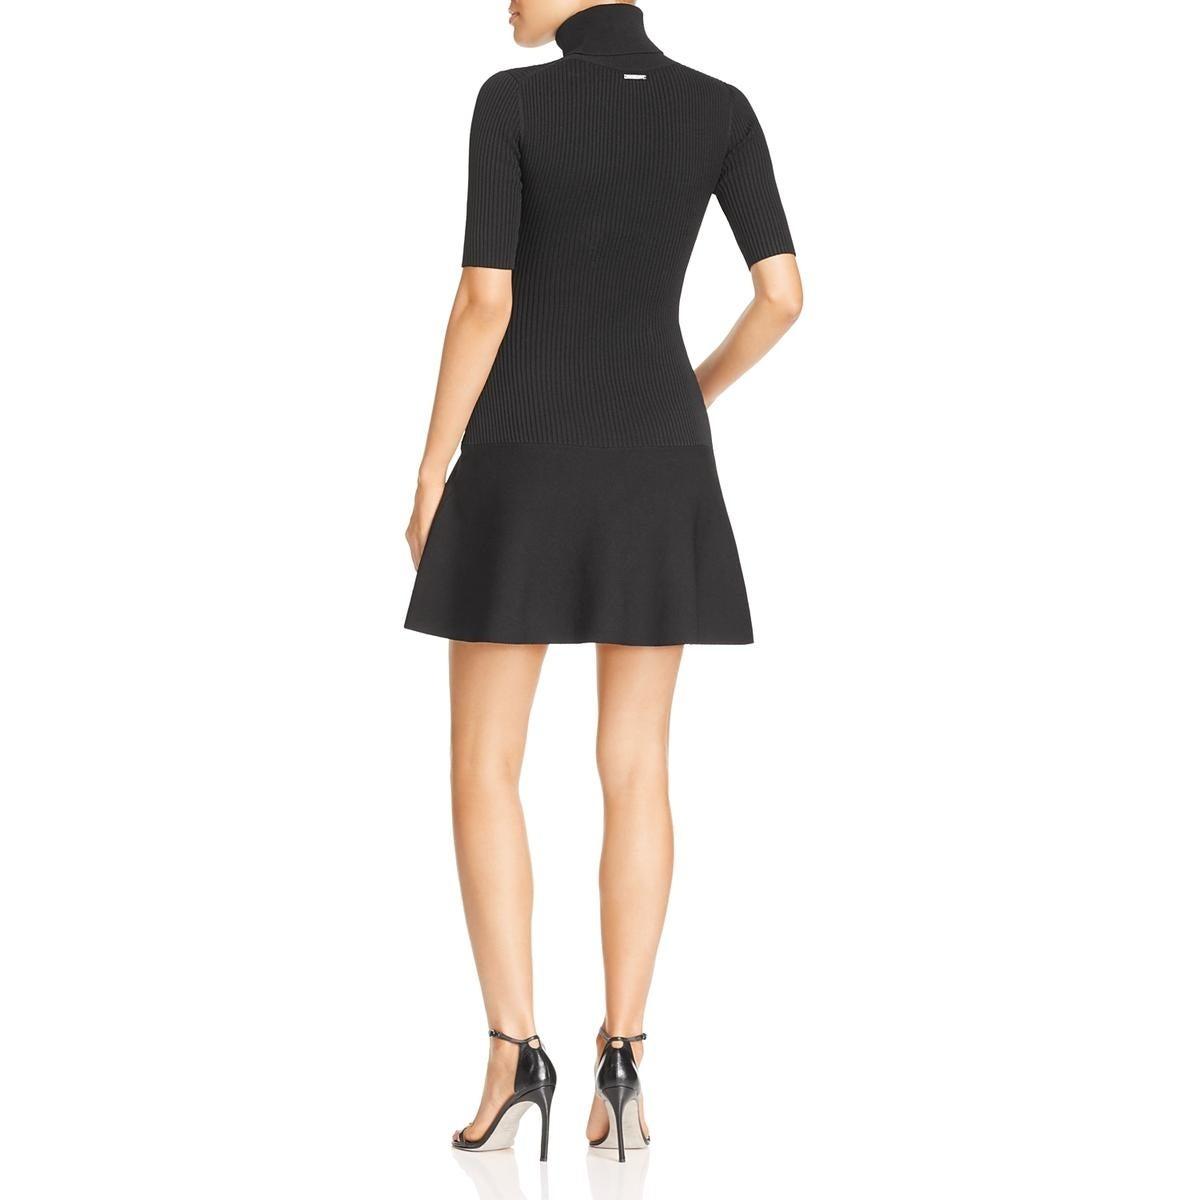 97fa409313d Shop MICHAEL Michael Kors Womens Sweaterdress Turtleneck Mini - Free  Shipping Today - Overstock - 22383434